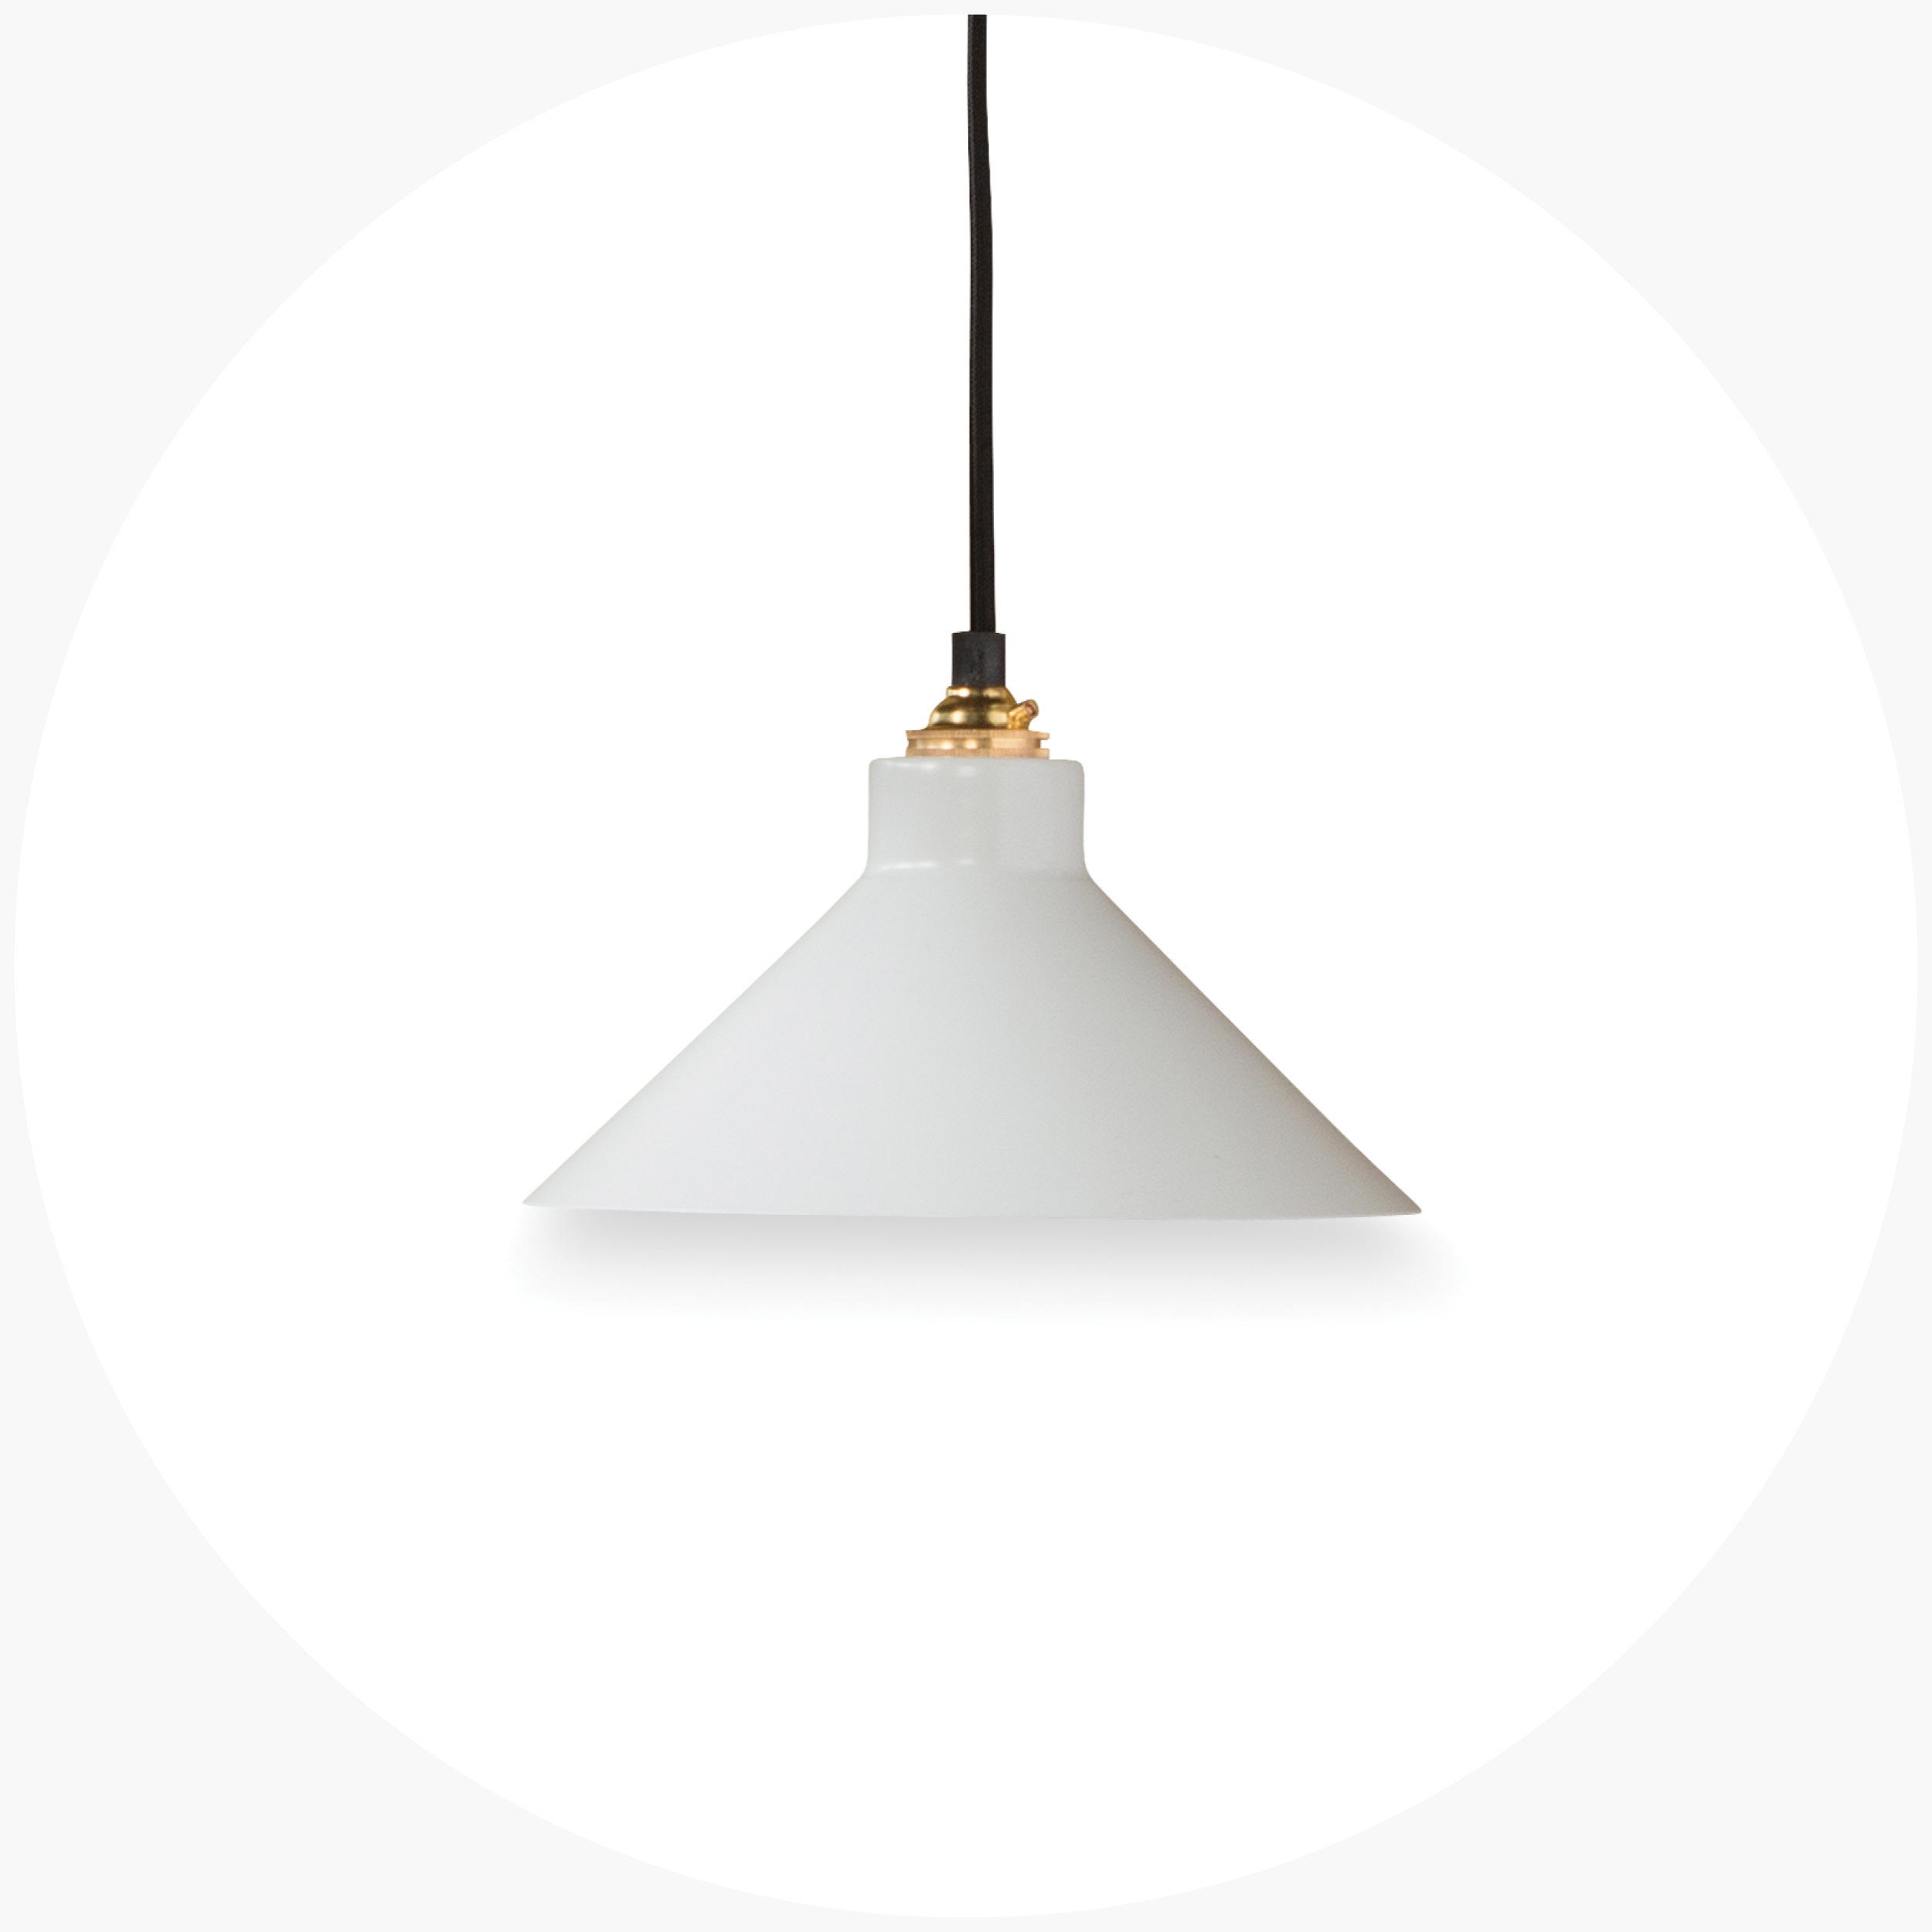 Terrain Pendant Light Shade  $79.90